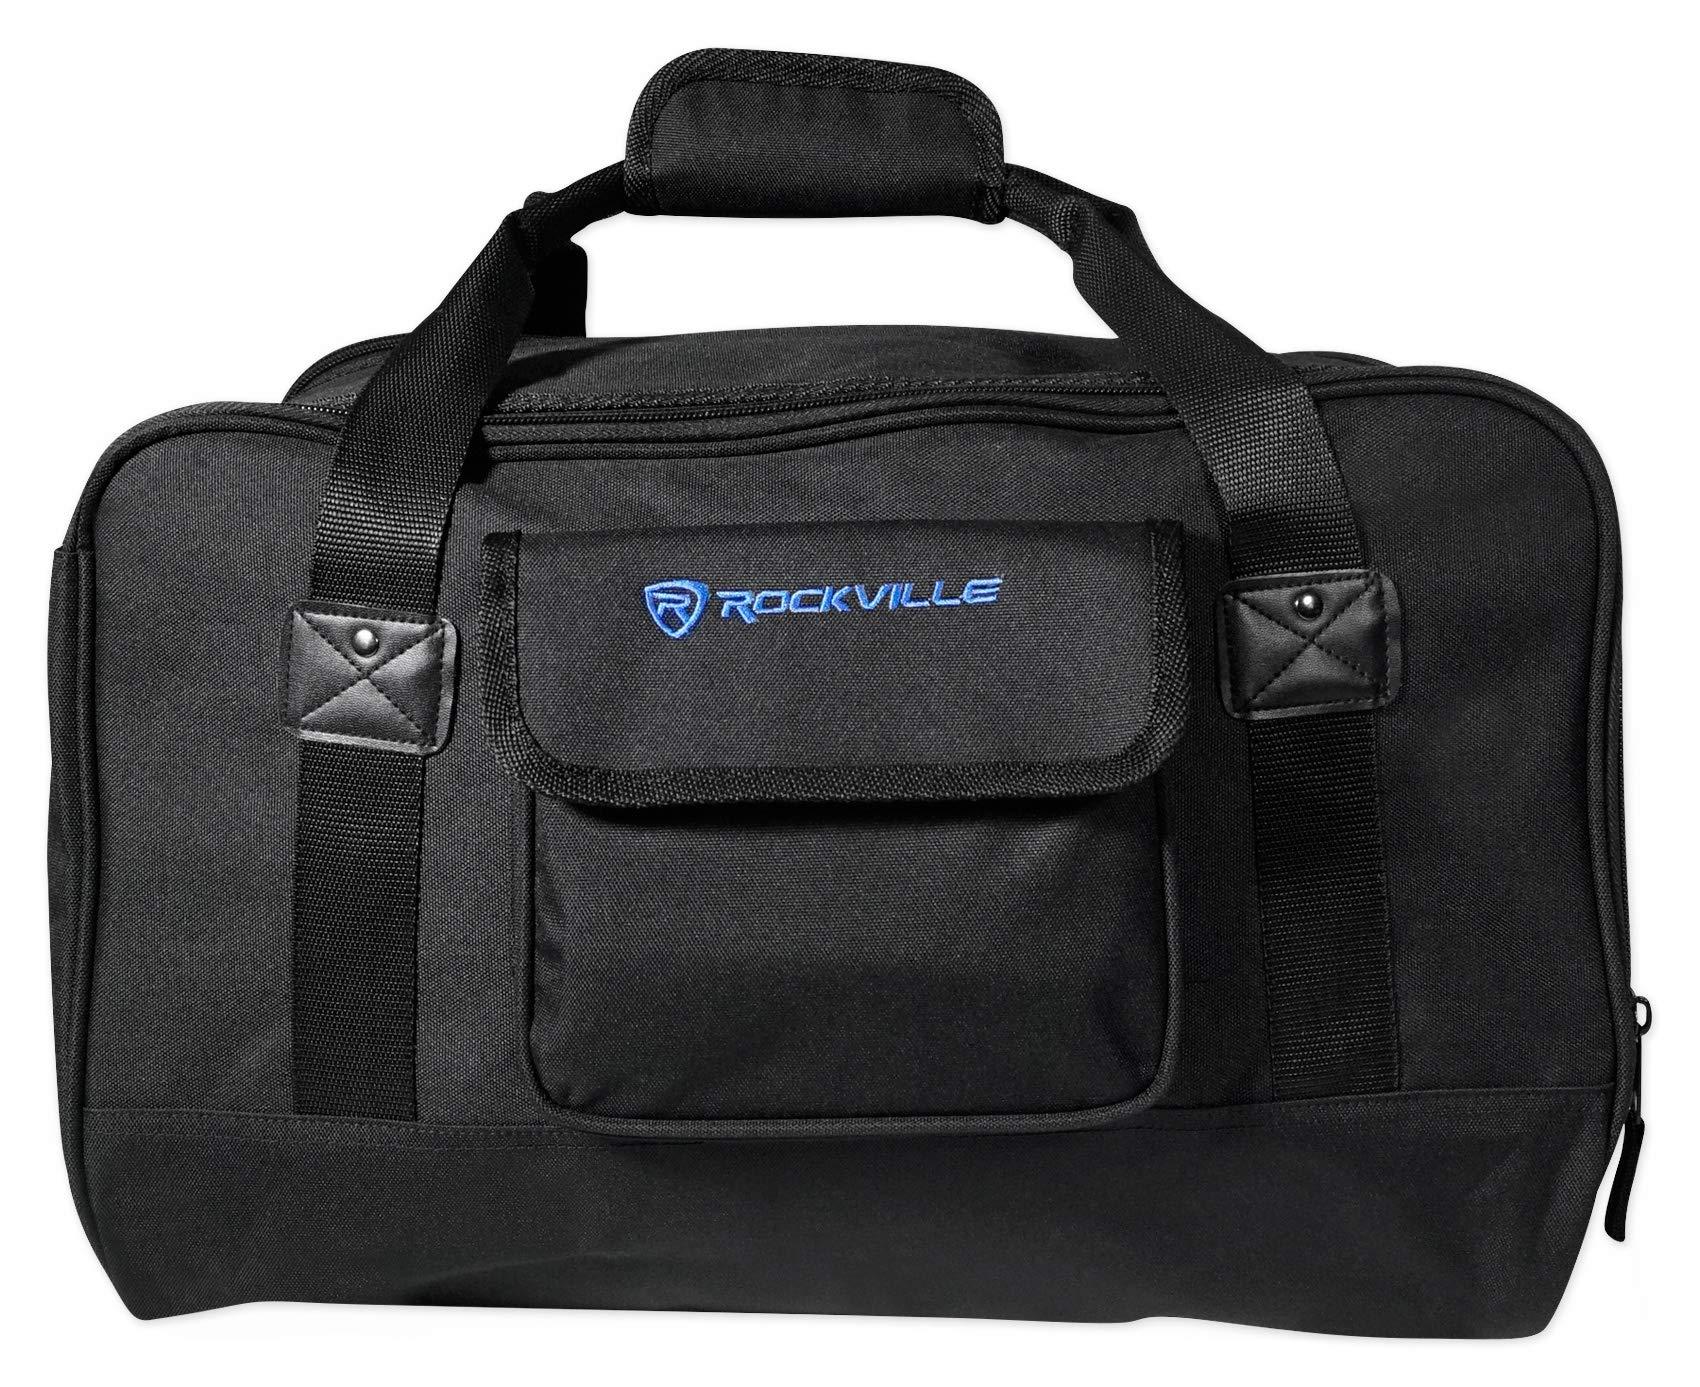 Rockville TB8 Lightweight Rugged Speaker Bag Carry Case for 8'' DJ PA Speakers